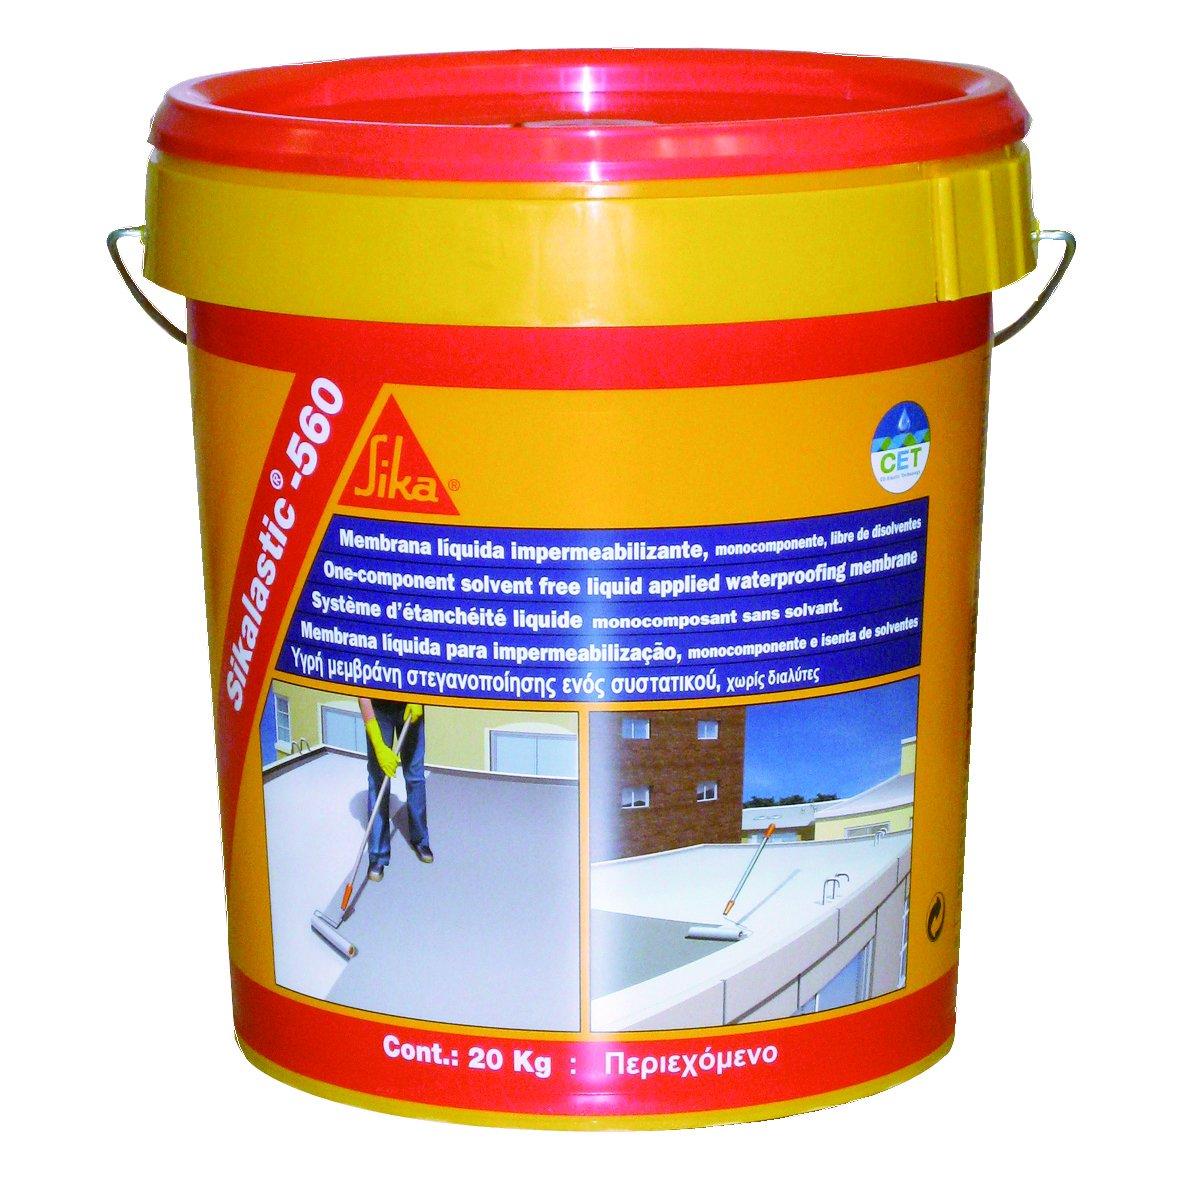 Oferta impermeabilizantes sika desde 1 74 kg blog for Pintura impermeabilizante sika